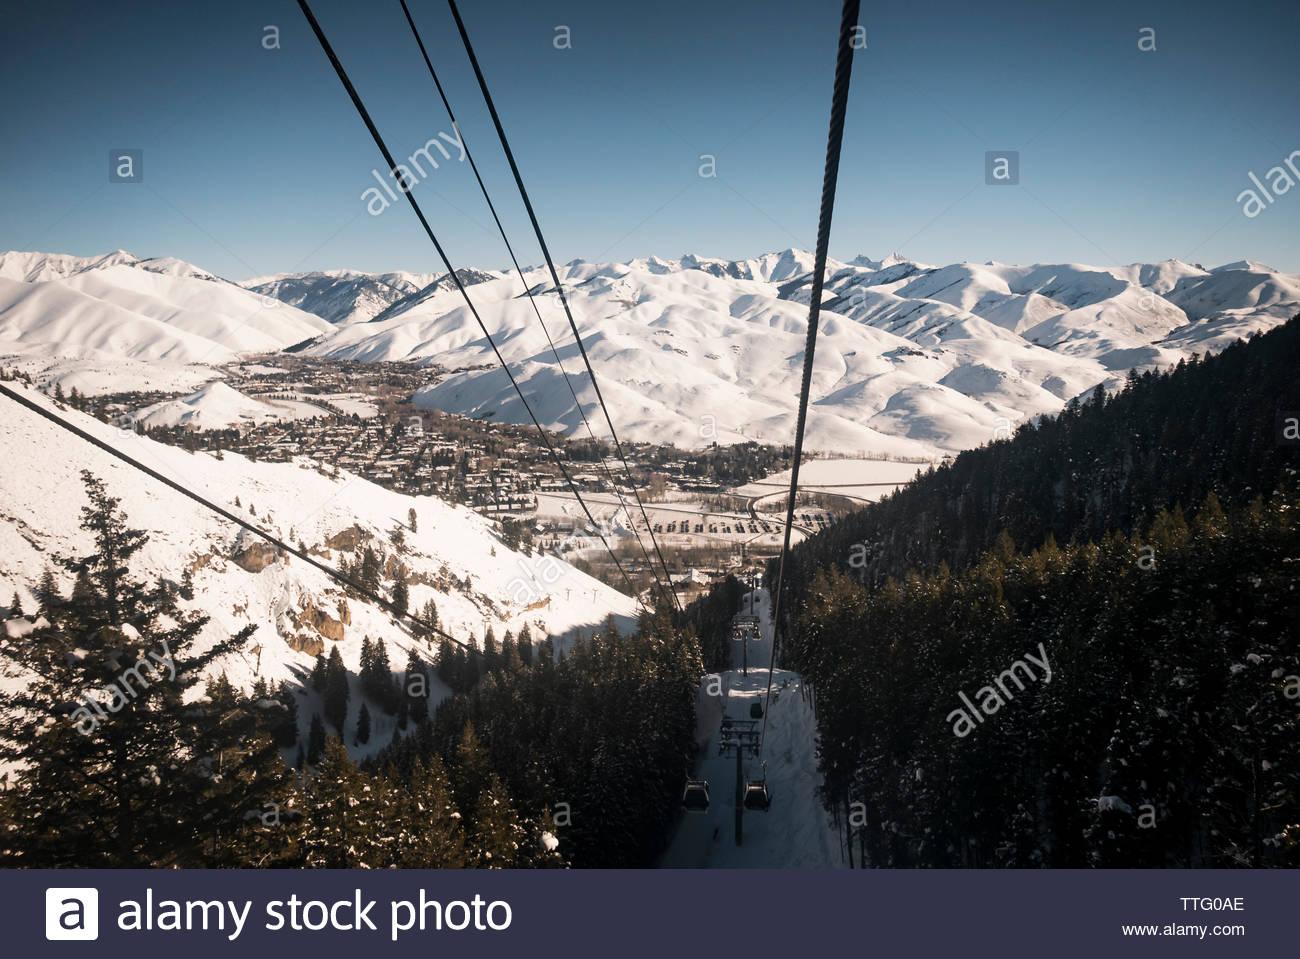 Headed up the gondola on a sunny blue bird day in Sun Valley, Idaho. - Stock Image